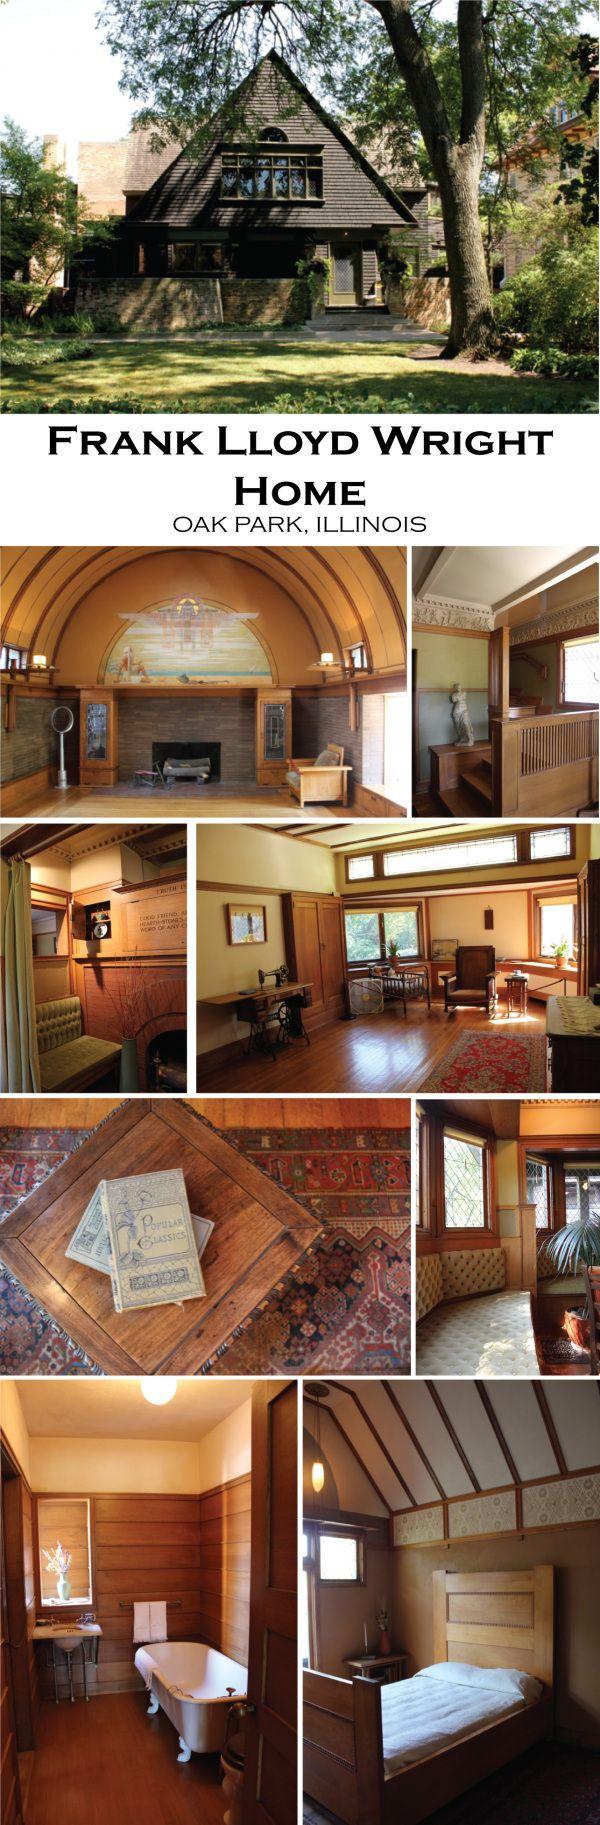 best 25 frank lloyd wright ideas on pinterest lloyd wright frank lloyd wright home and studio oak park illinois 1889 1898